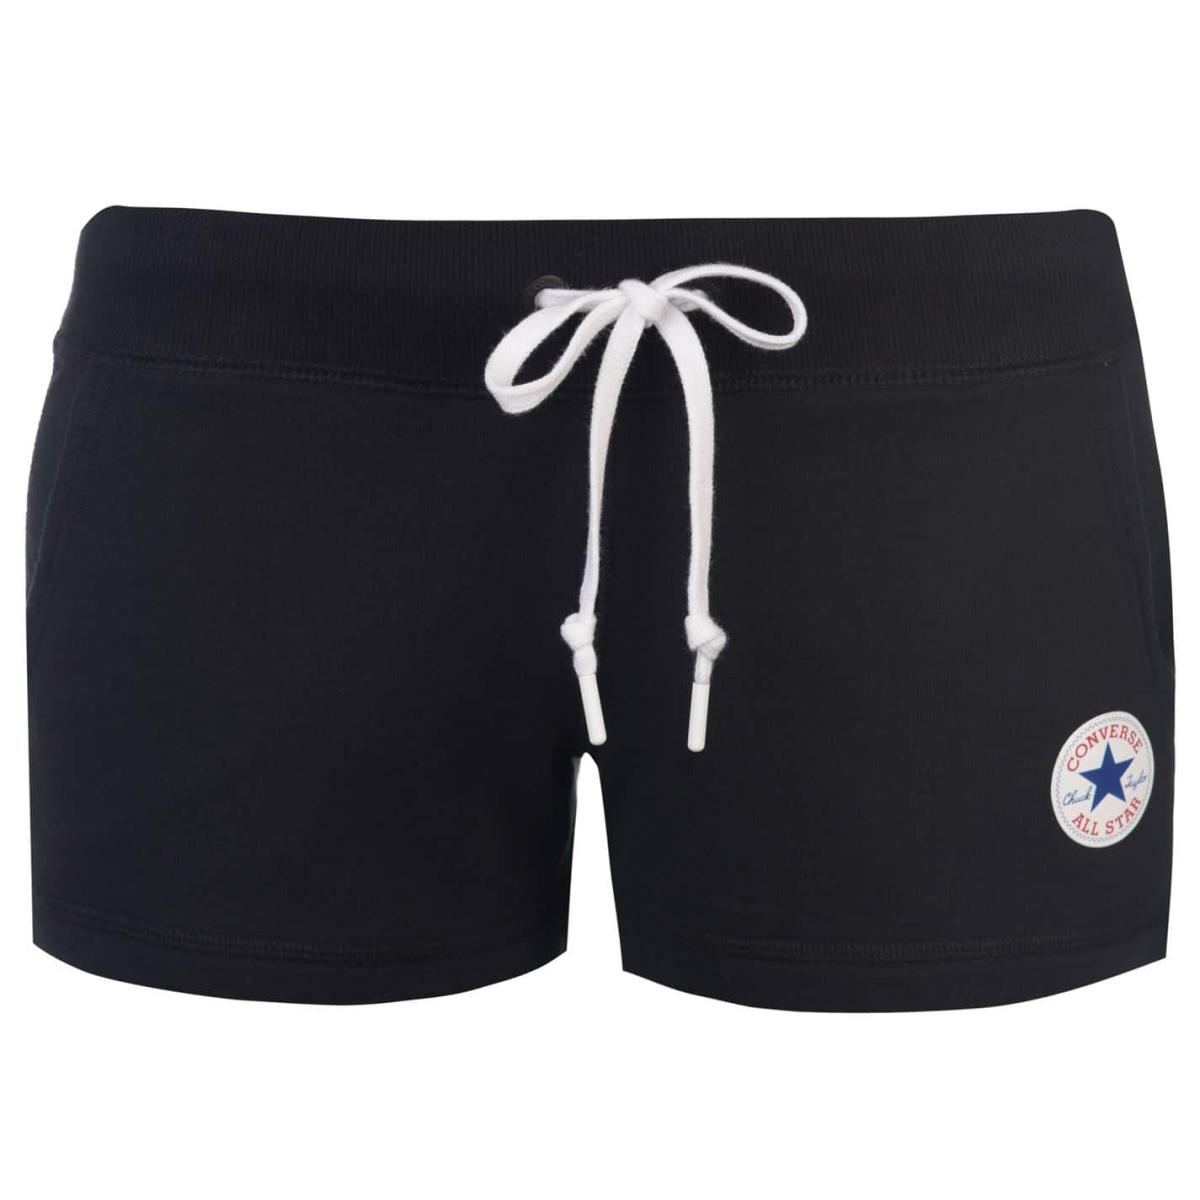 Converse Core Kurzhose Shorts Damen Schwarz